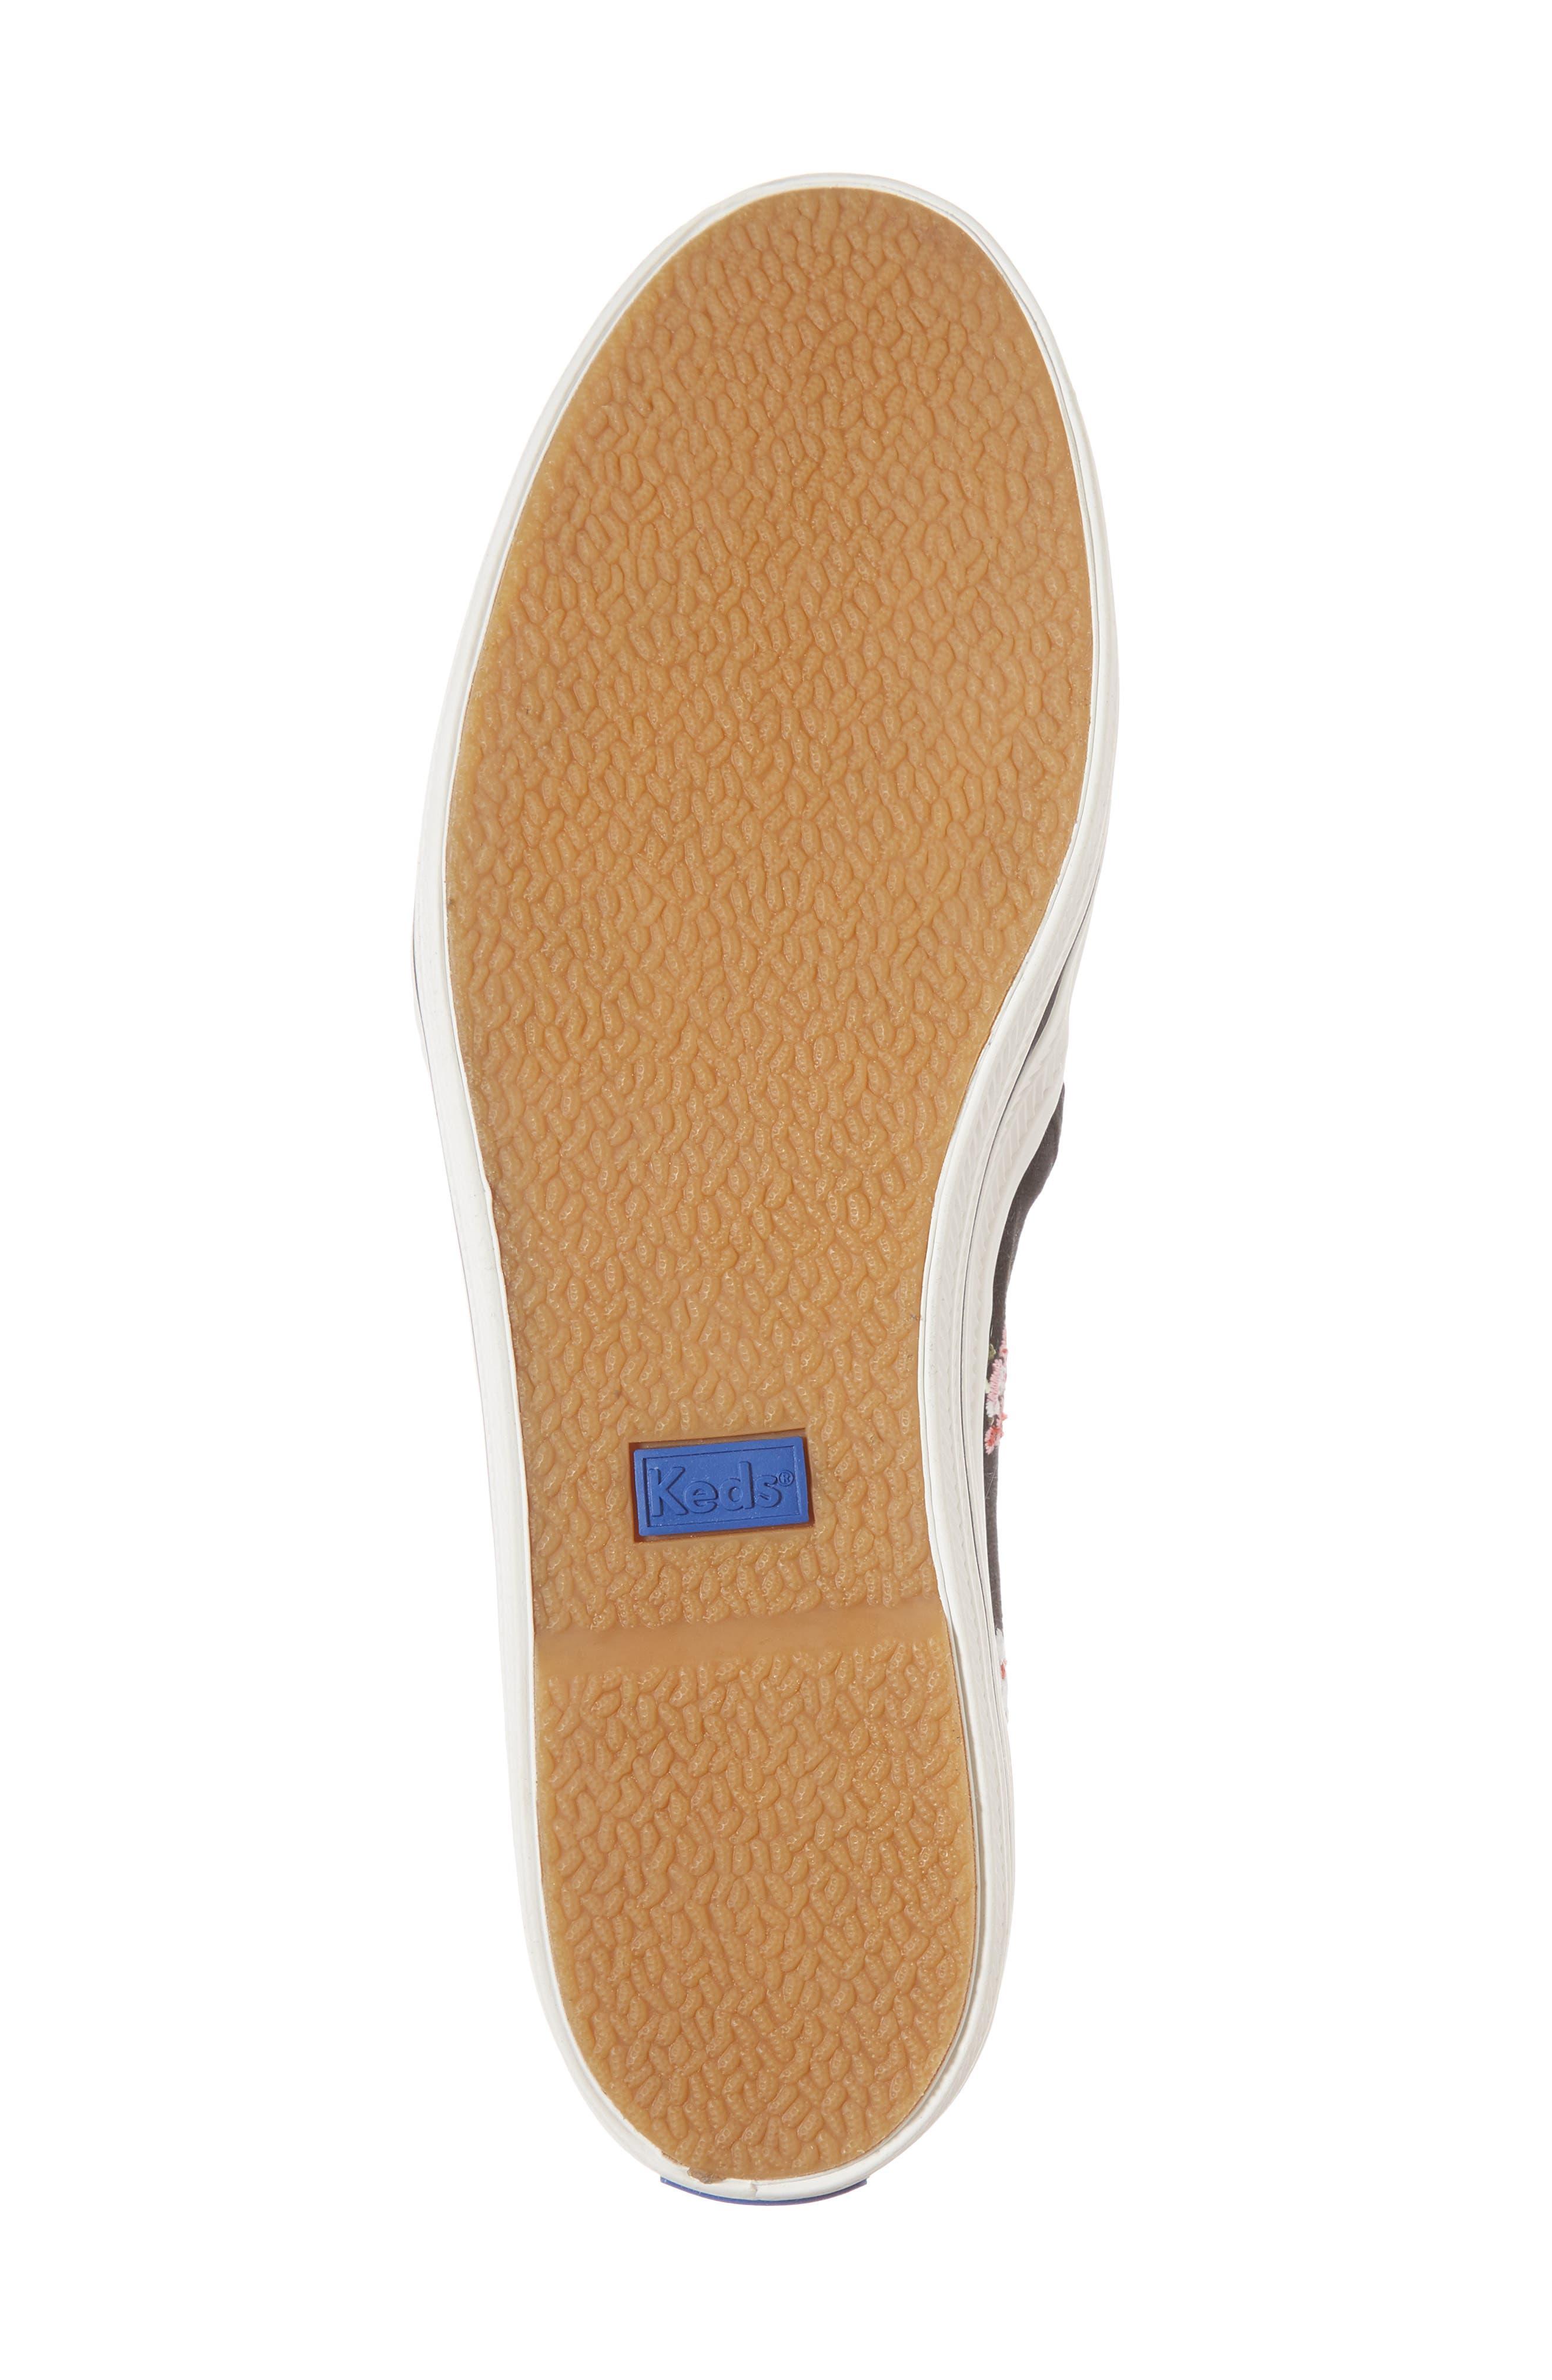 Keds<sup>®</sup> x kate spade Triple Decker Slip-On Sneaker,                             Alternate thumbnail 12, color,